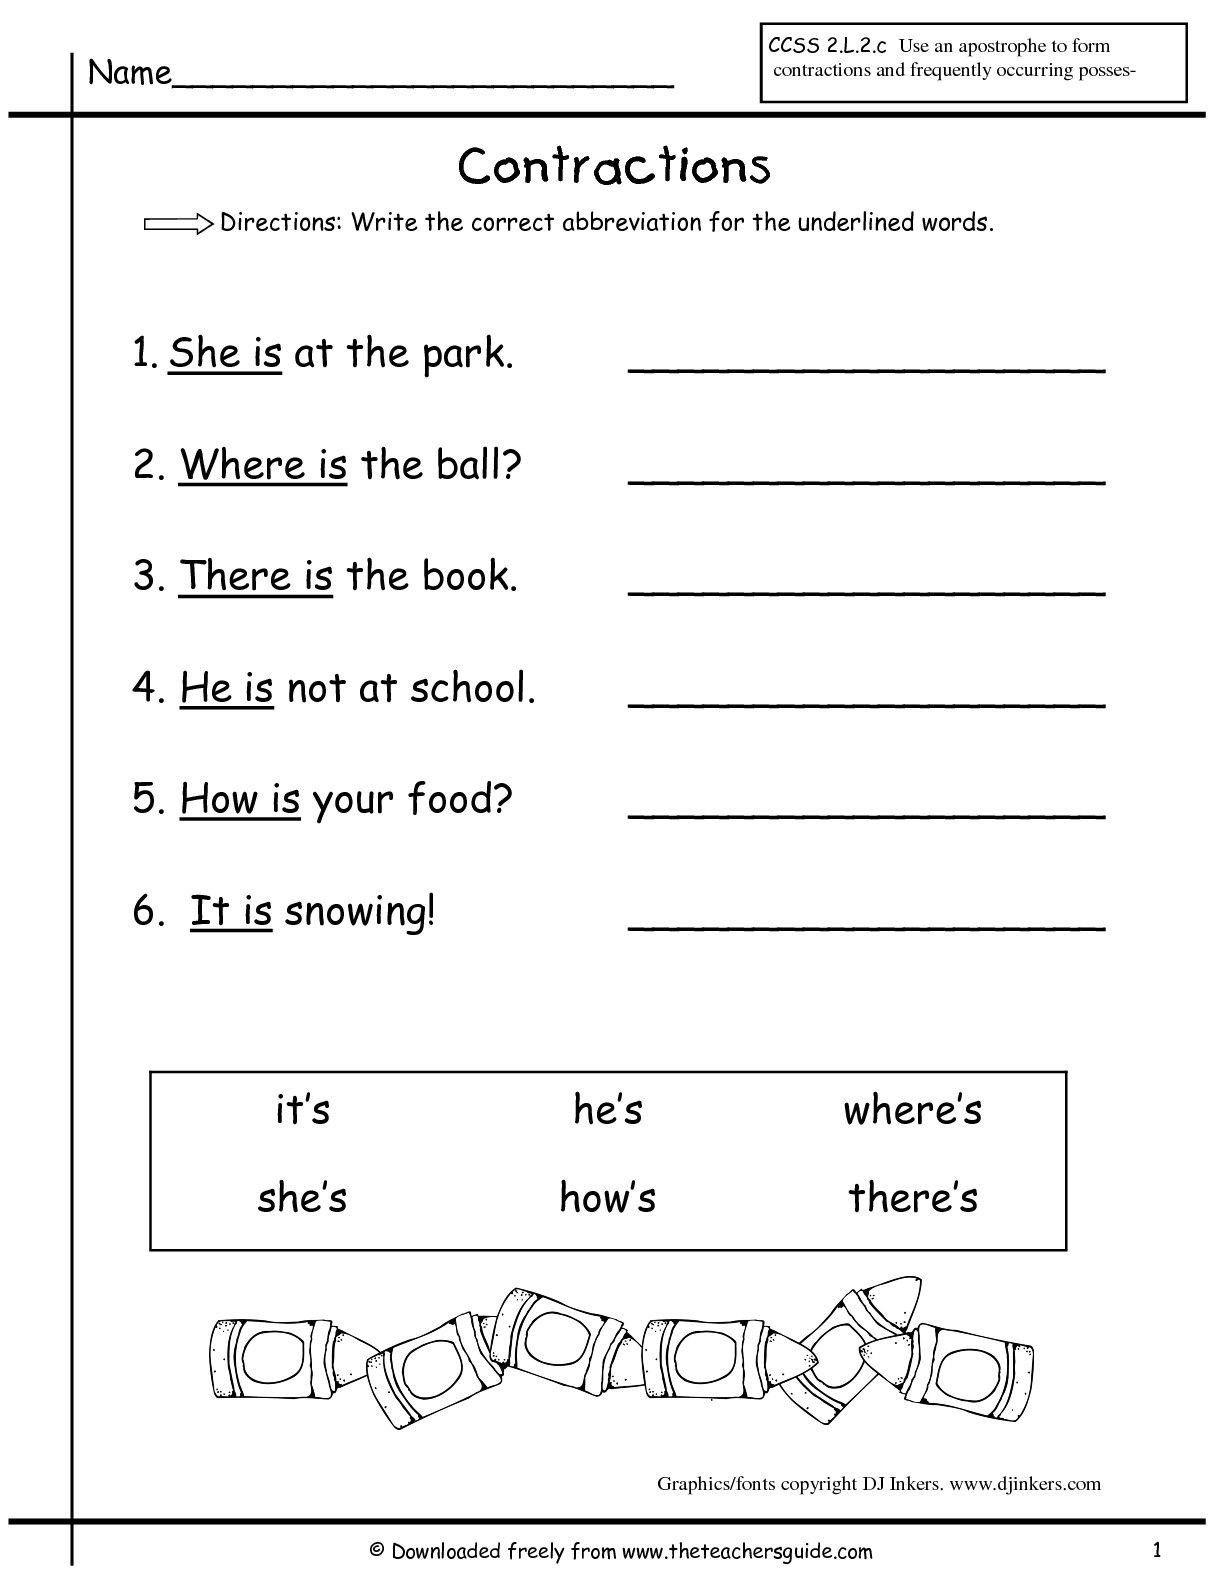 Free Earth Science Worksheets Inspirational Science Worksheets for Grade to  Print Free Printable B…   Biology worksheet [ 1584 x 1224 Pixel ]